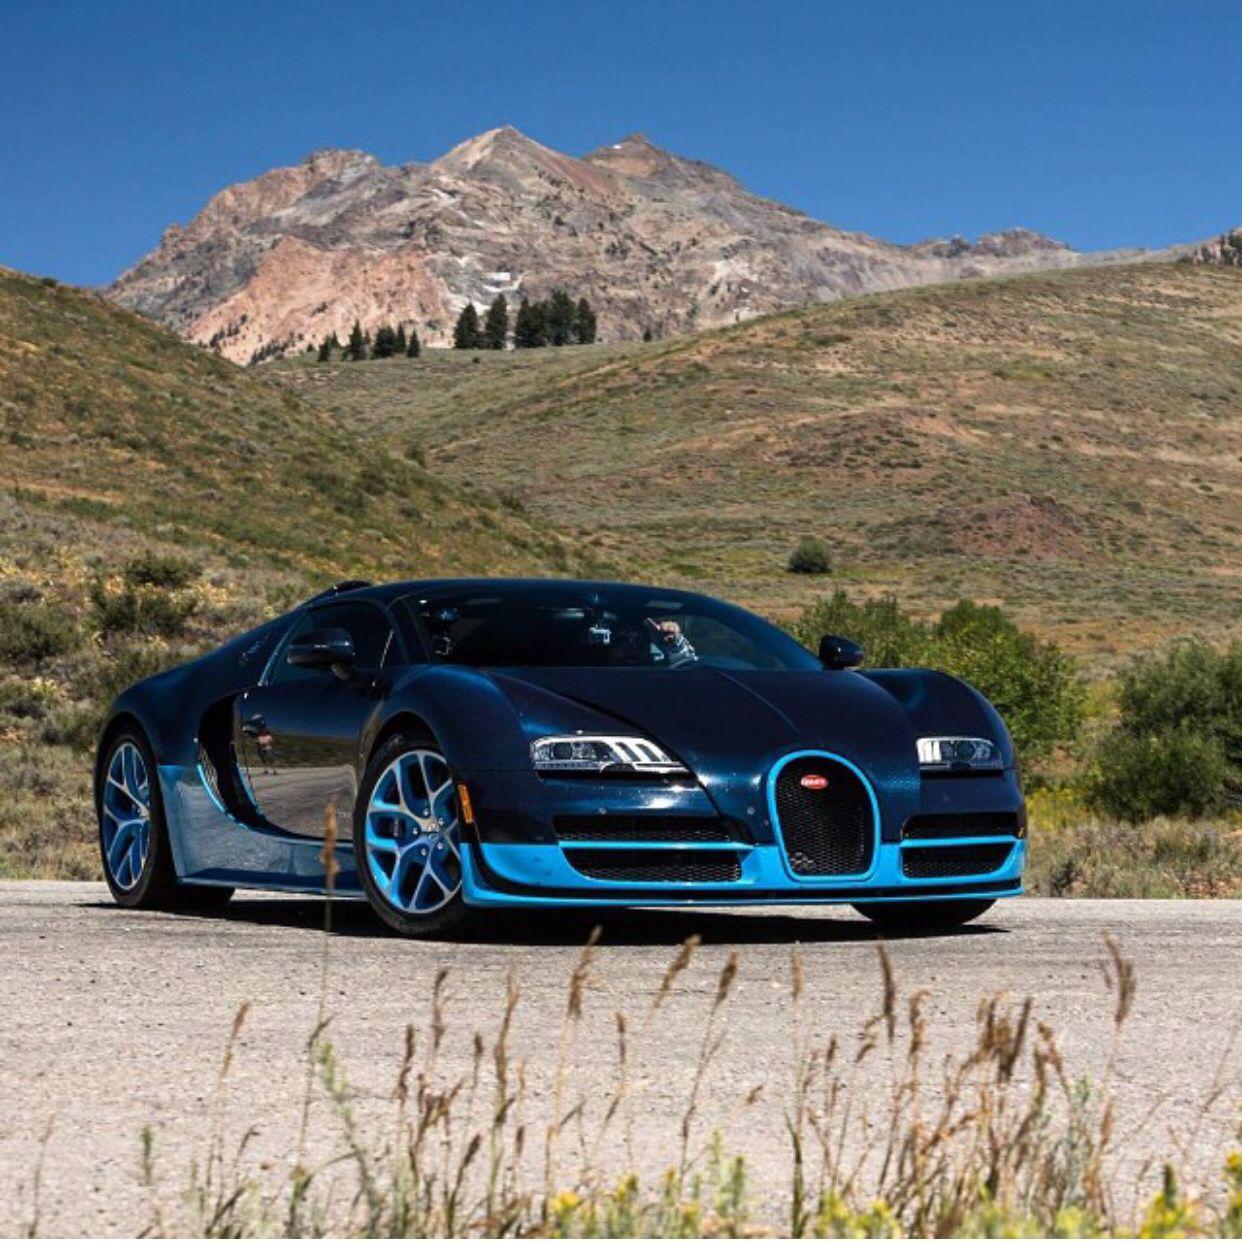 Bugatti Veyron Grand Sport Vitesse Painted In Black And: Bugatti Grand Sport Vitesse Painted In Light Light Blue